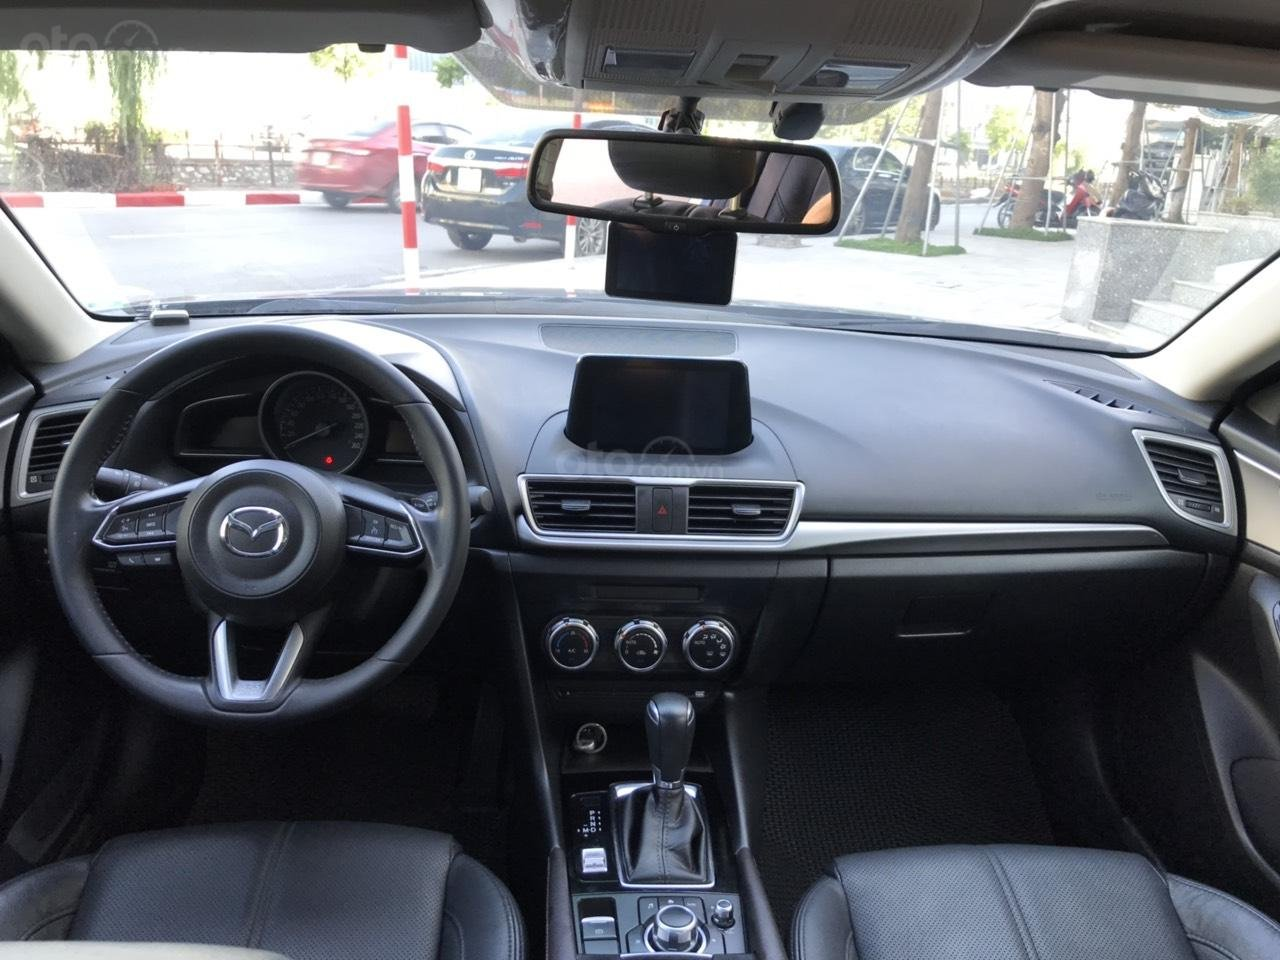 ManyCar bán Mazda 3 sedan model 2018, xe đẹp đi ít (2)